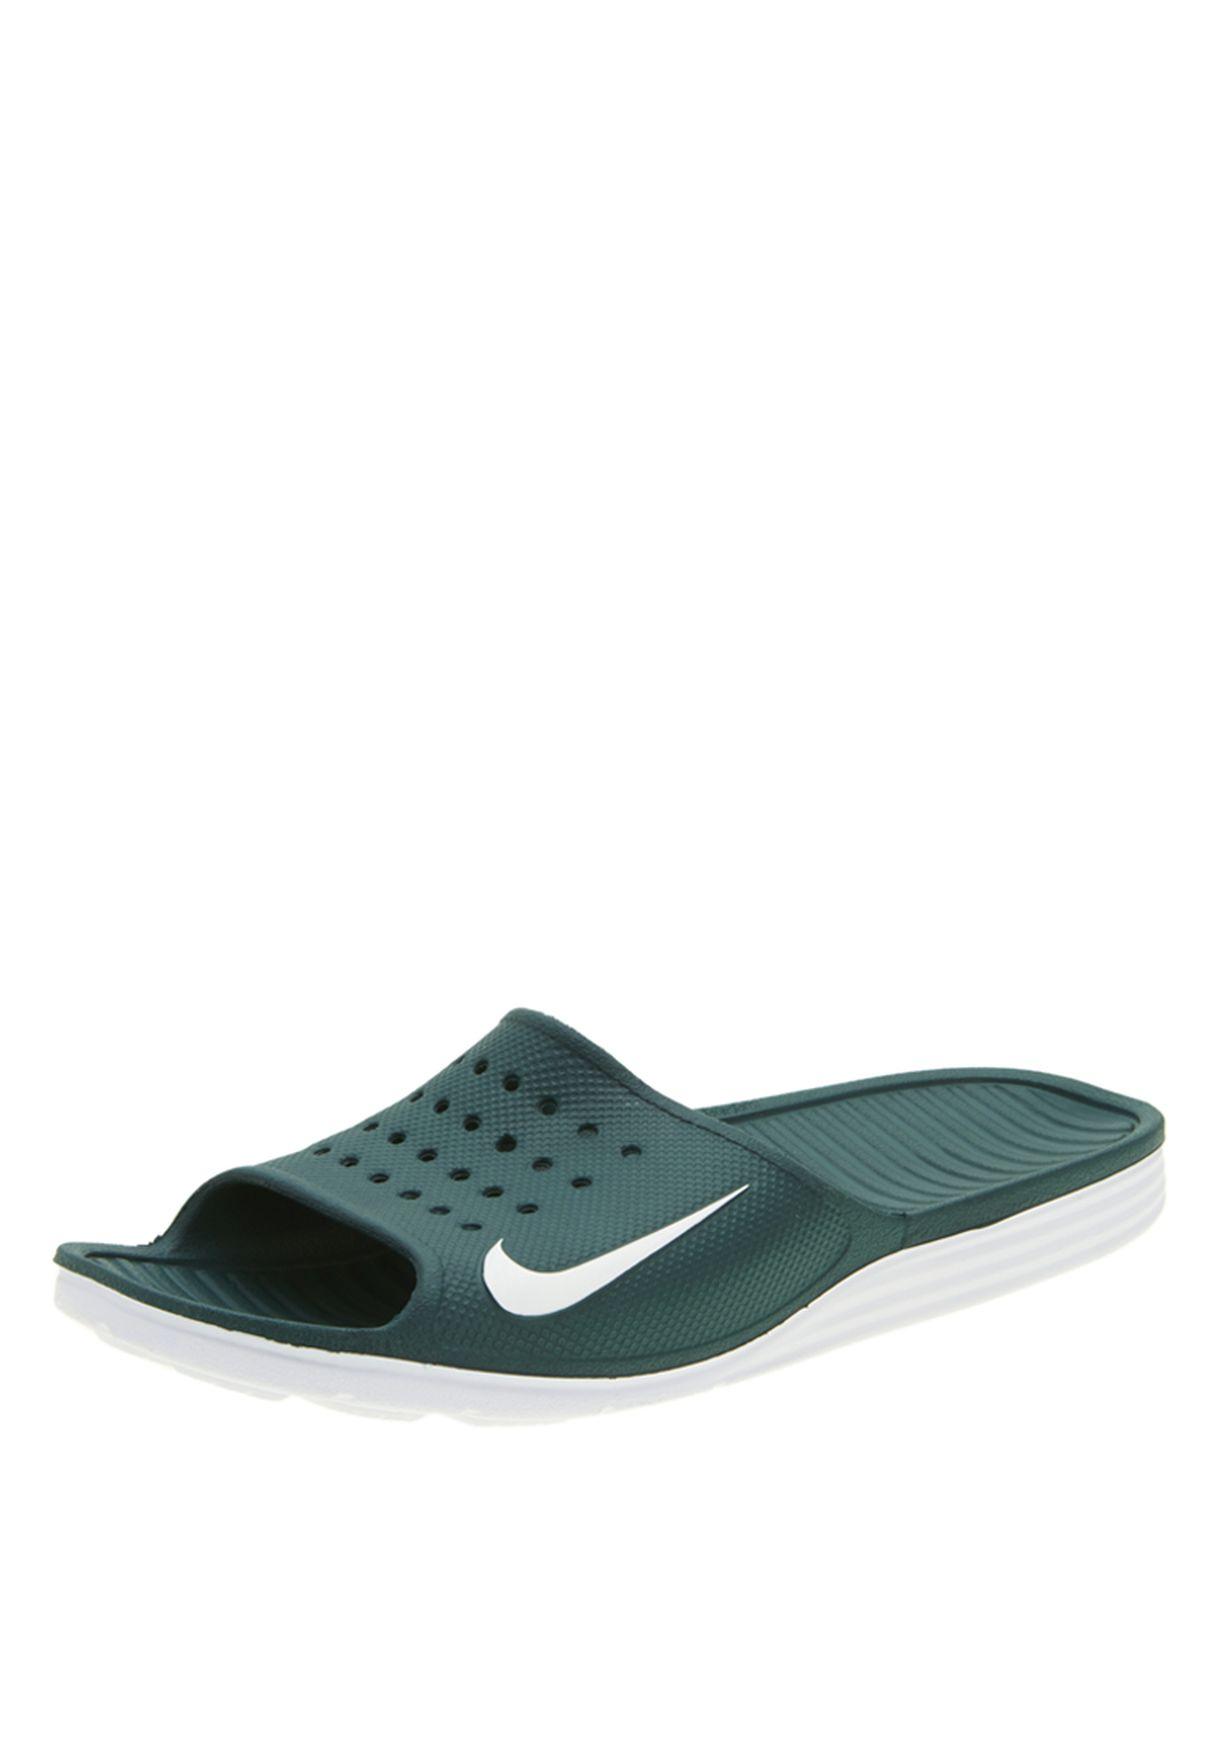 d834e606a9b1a Shop Nike blue Solarsoft Slide Sandals 386163-304 for Men in UAE ...